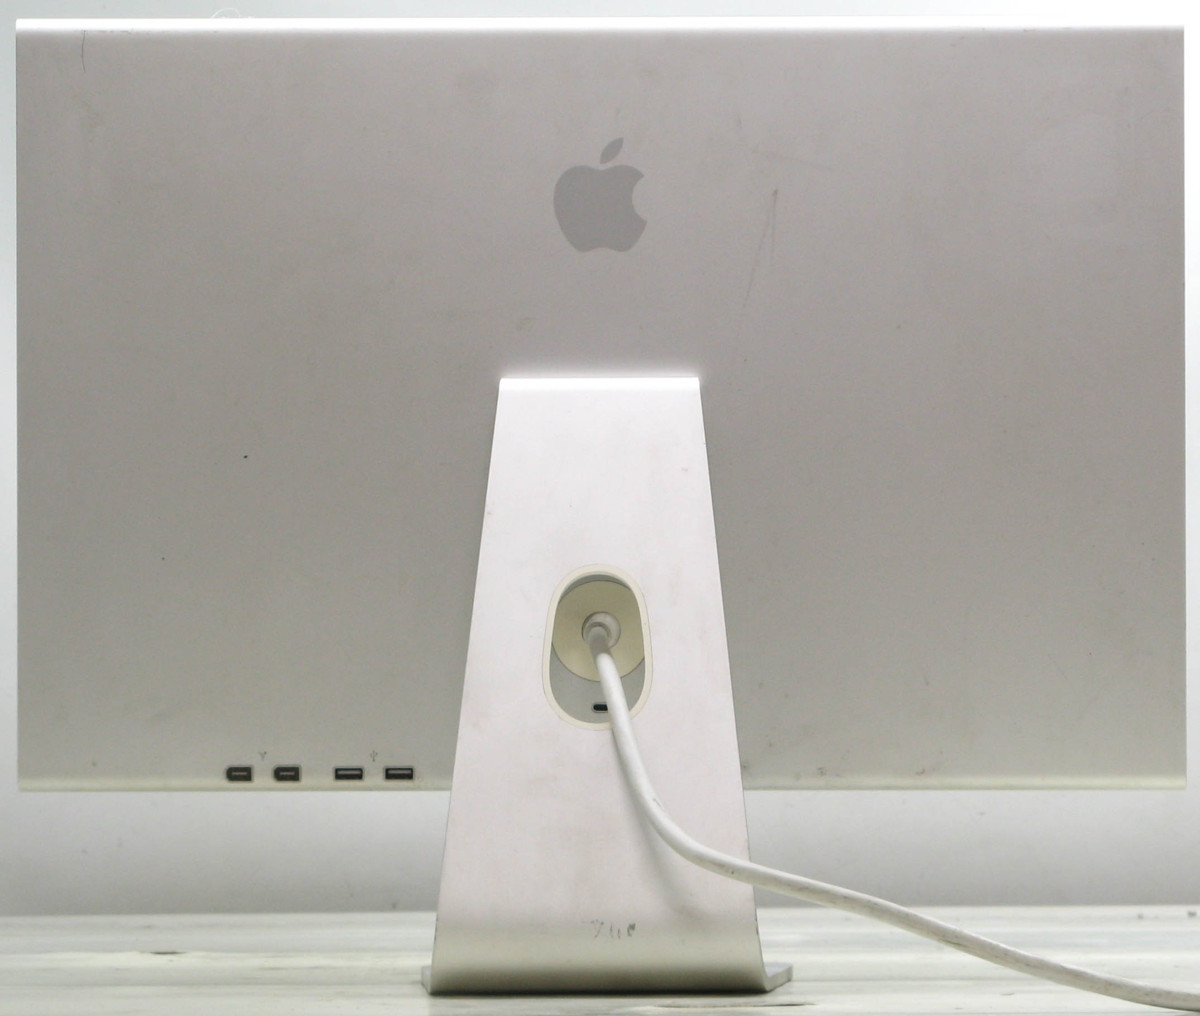 O-3100/Apple Cinema HD Display M9178J/A■23インチTFT液晶モニター■#2